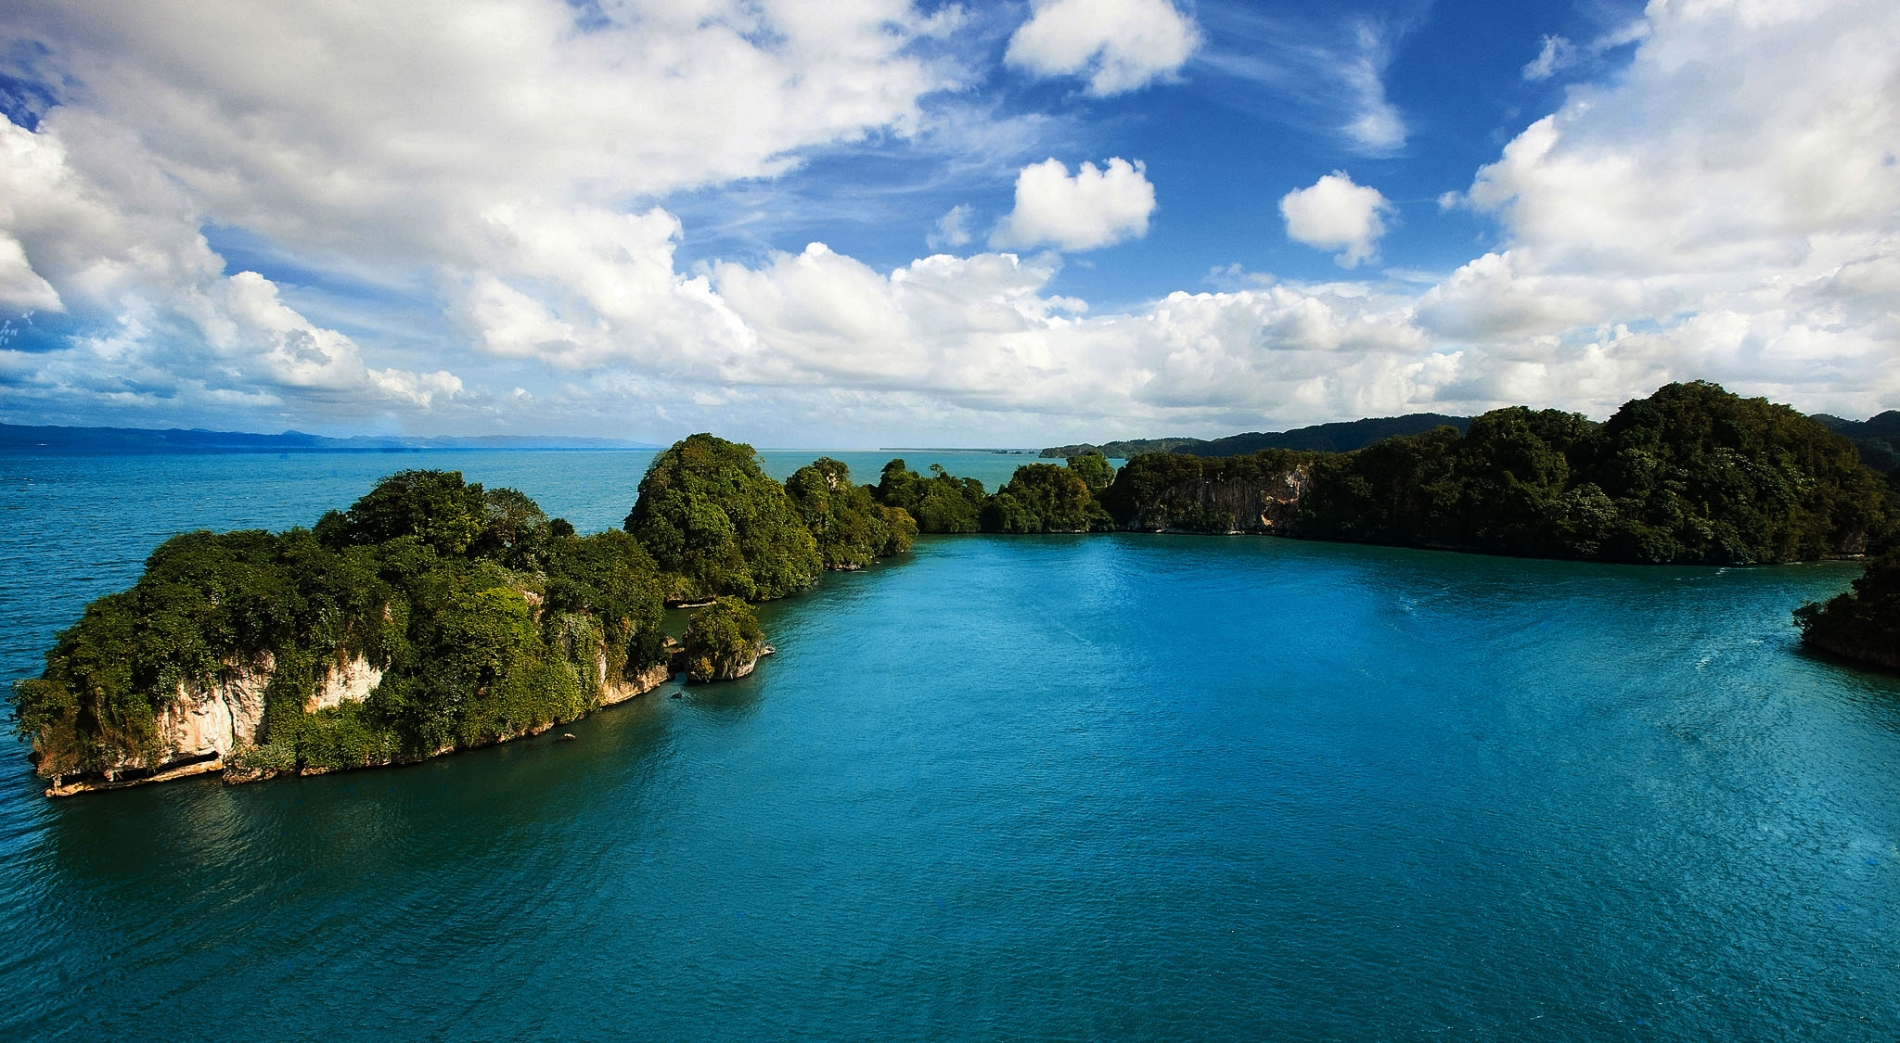 Parque Nacional Los Haitises de Samaná_2